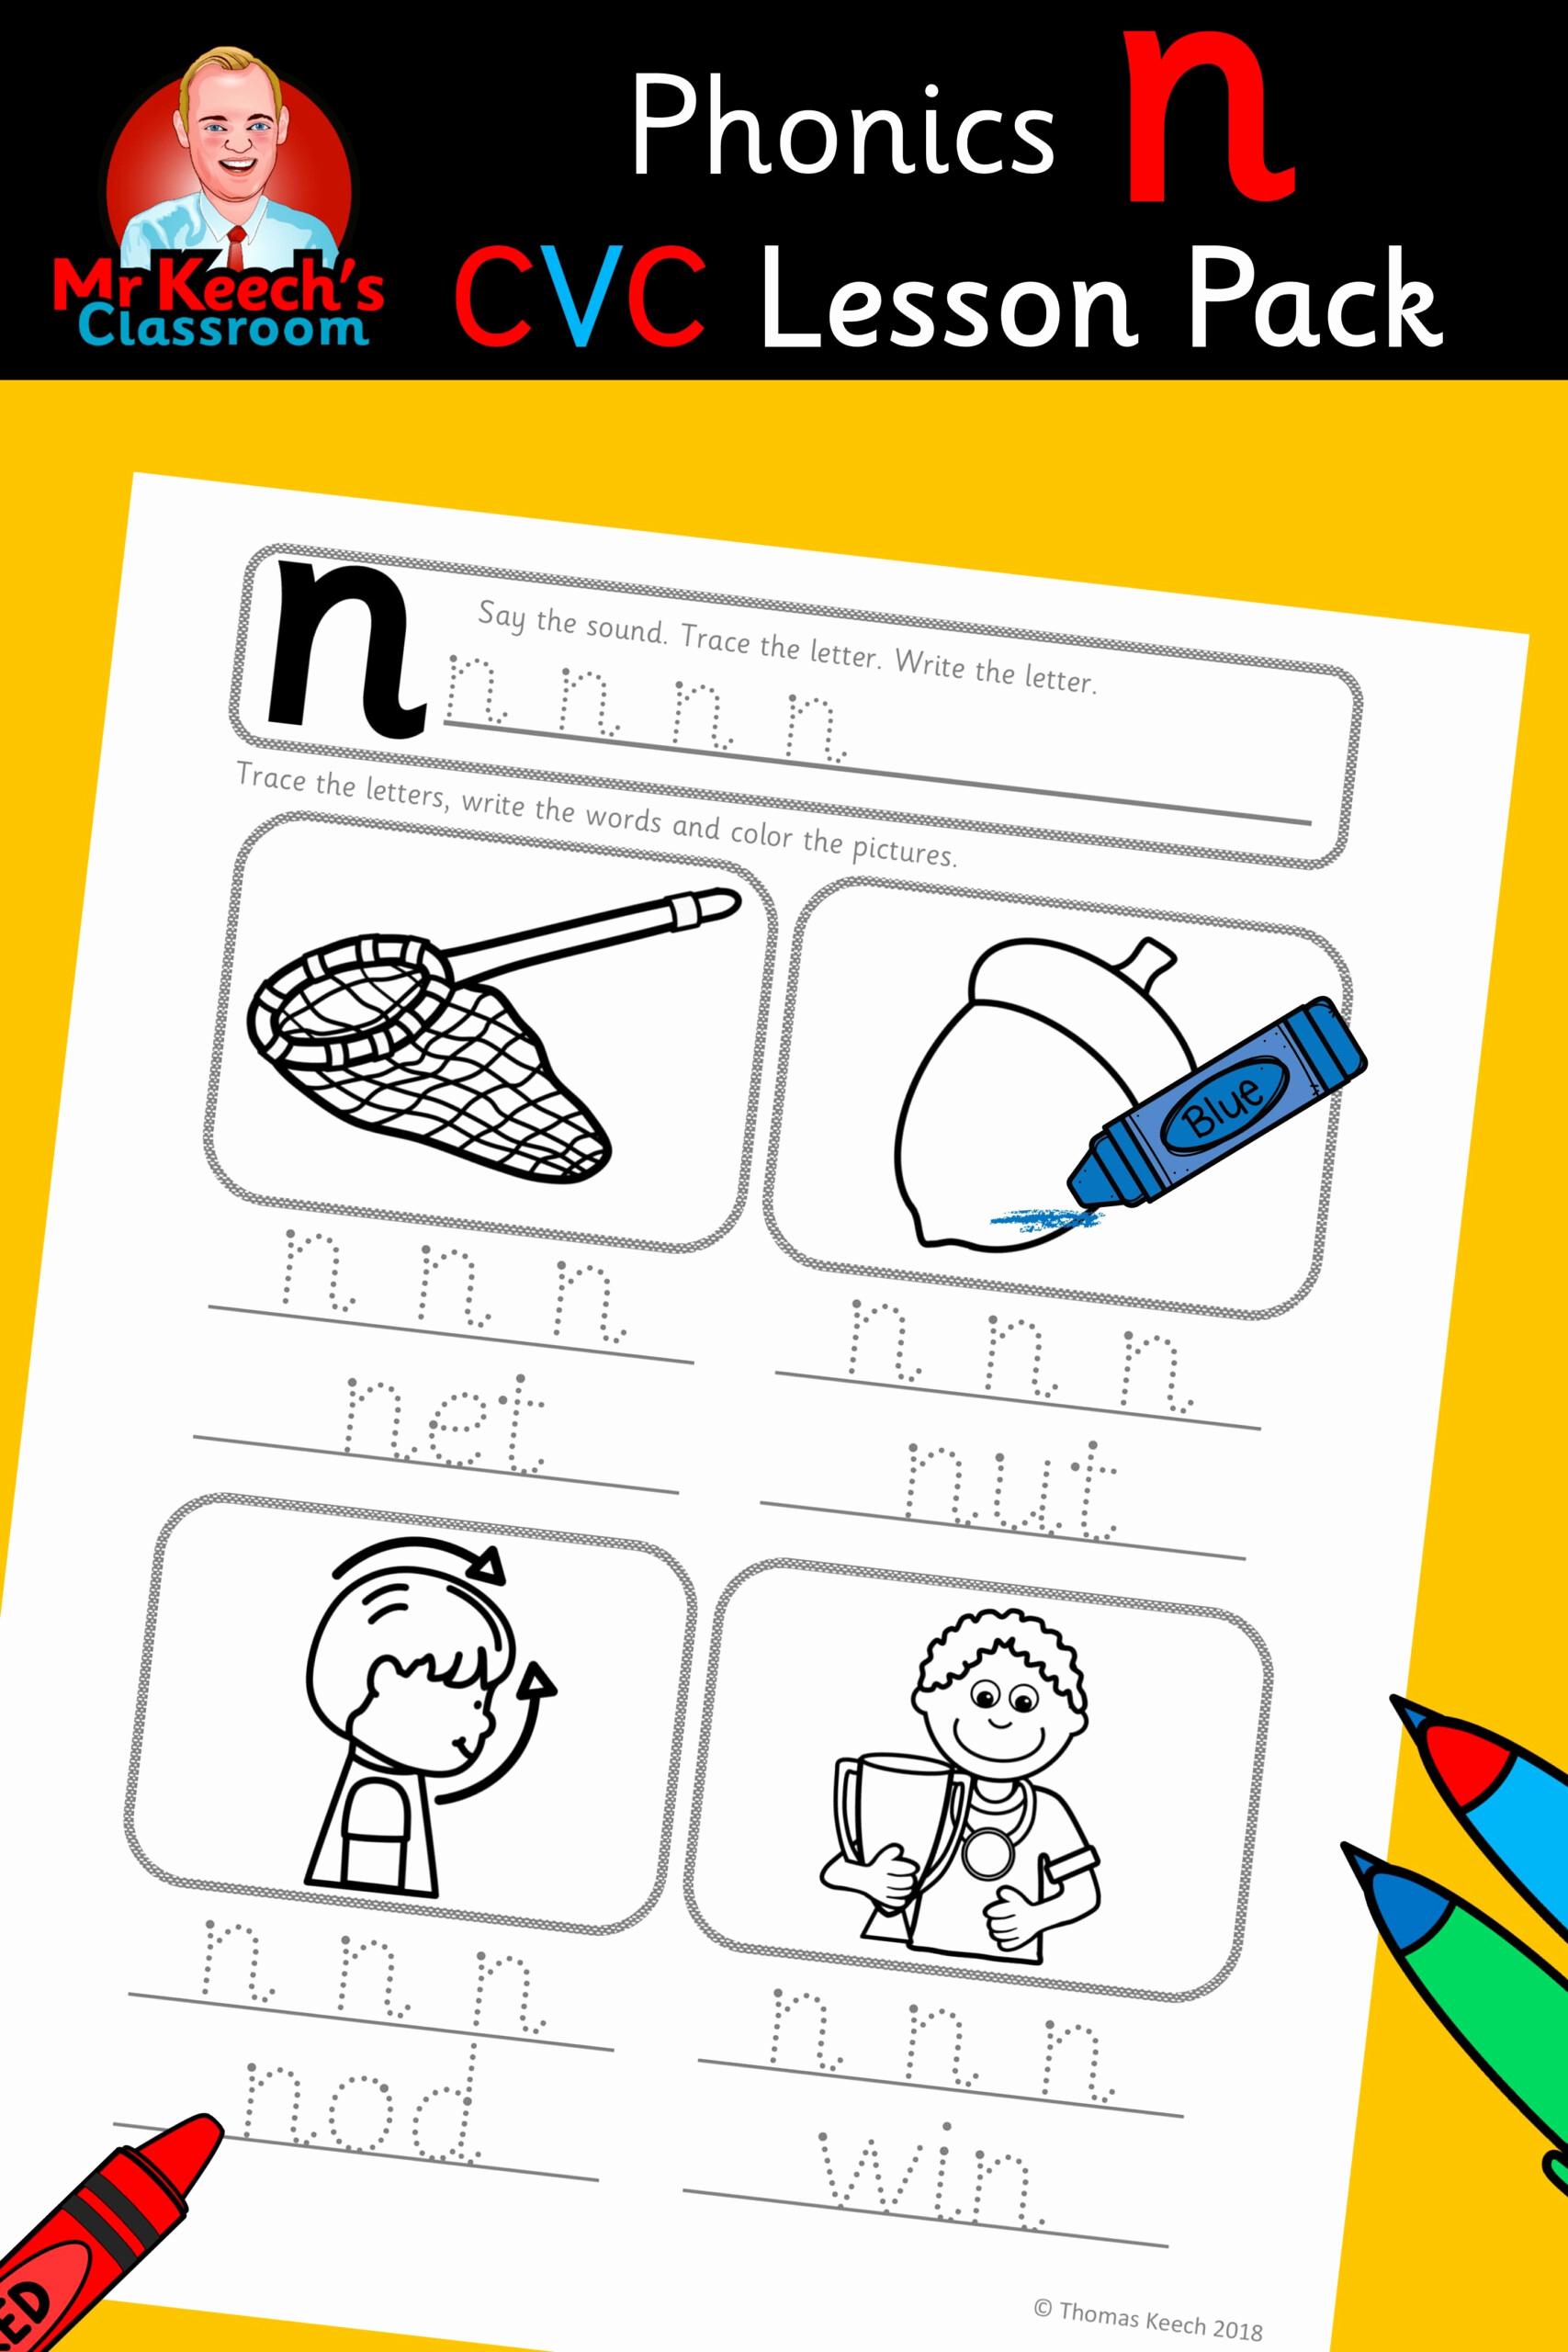 Jolly Phonics Worksheets for Kindergarten Elegant Tracing Letters Jolly Phonics